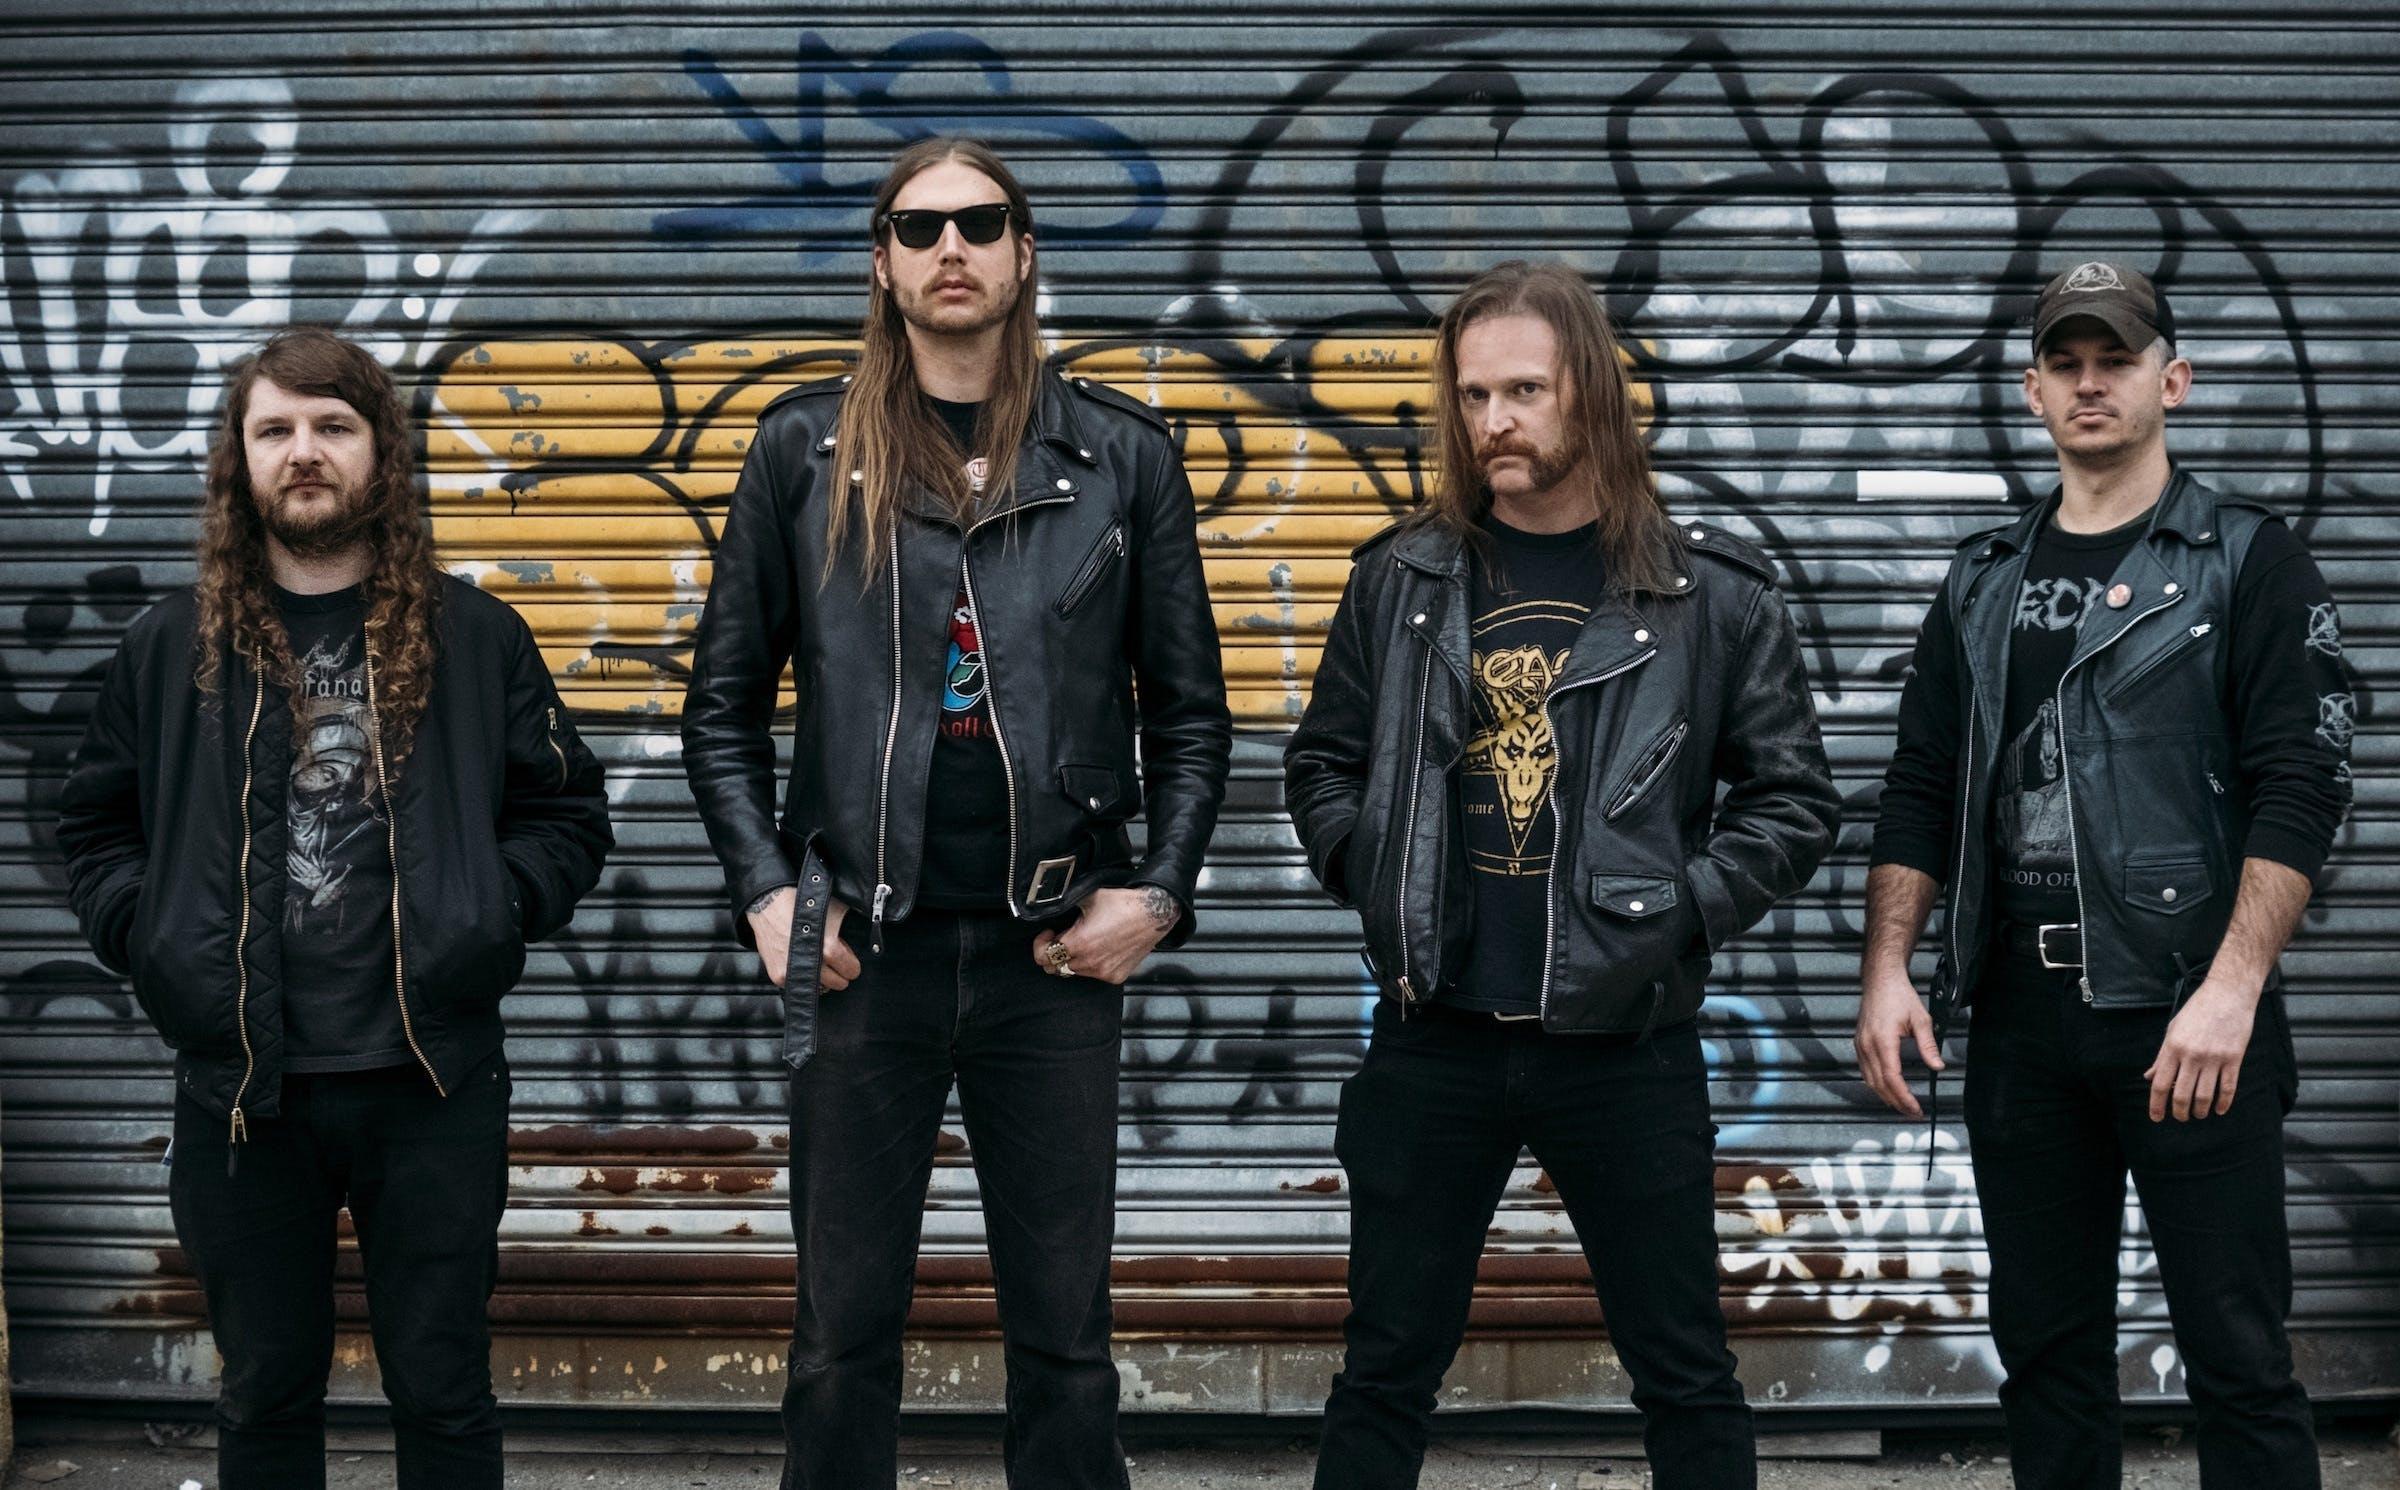 Exclusive: Overdose (Mutilation Rites, ex-Speedwolf) Bring Street Metal To The Masses